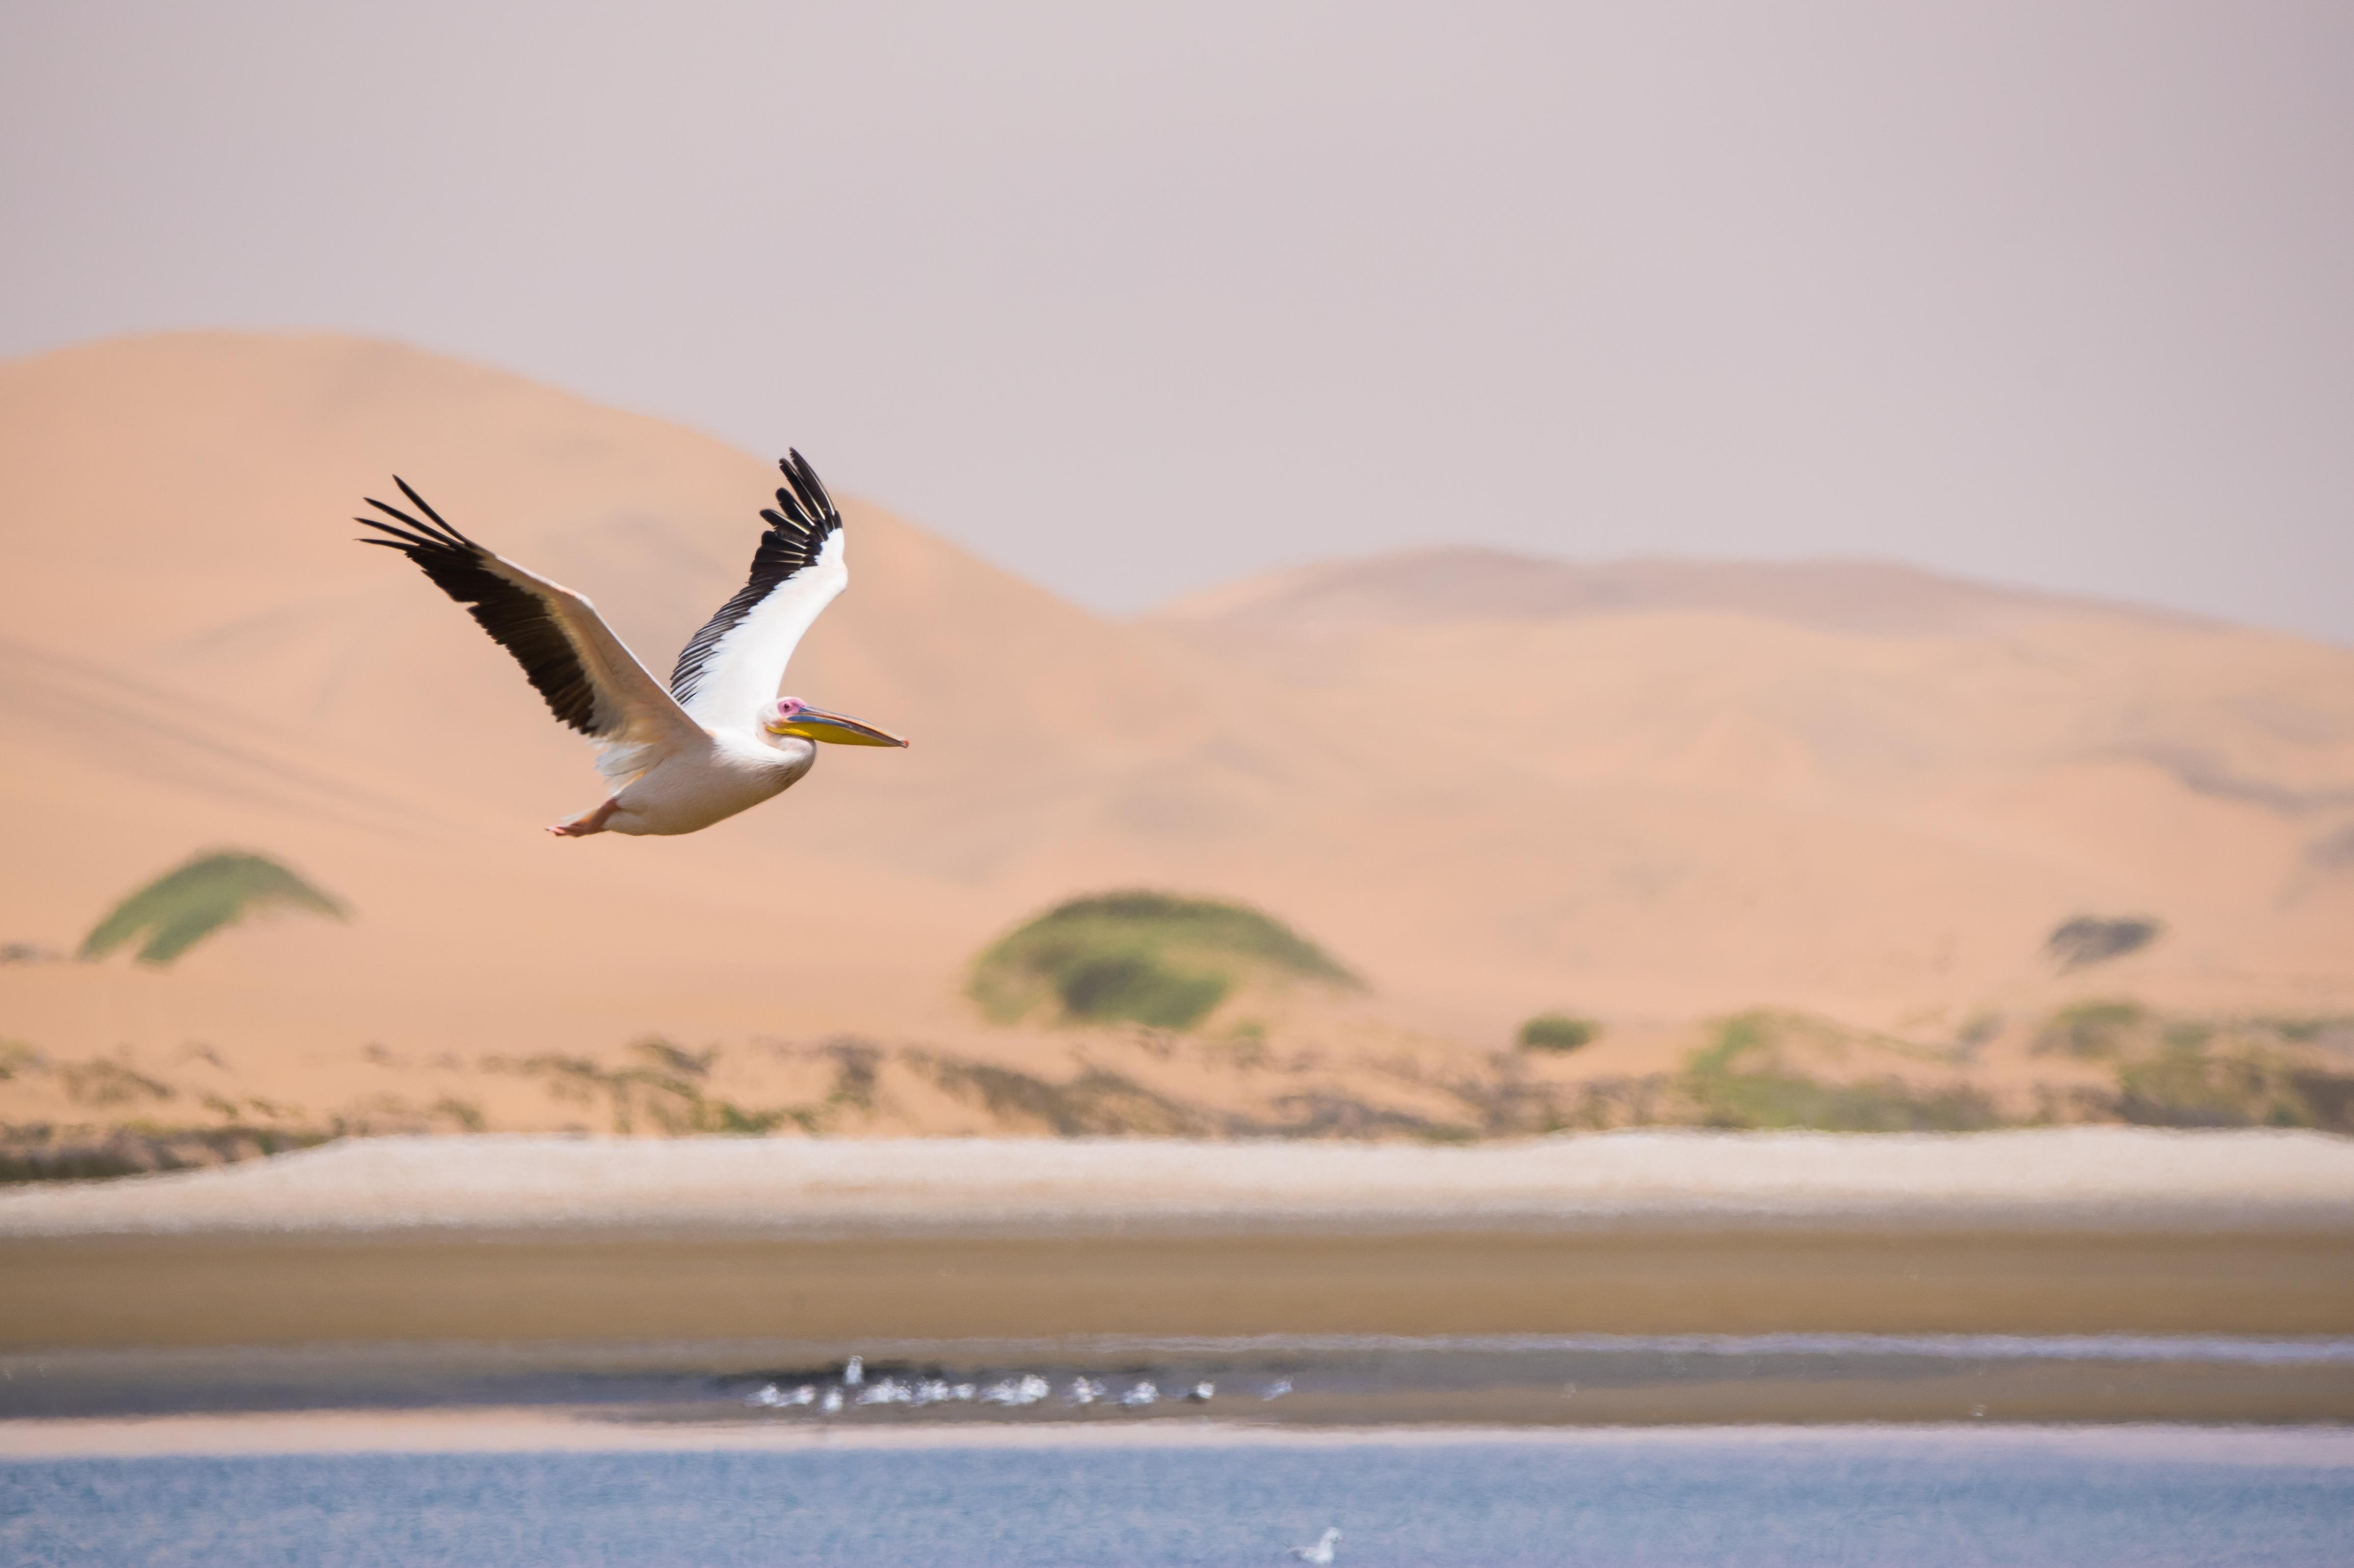 Sandwich Harbor, Namibia